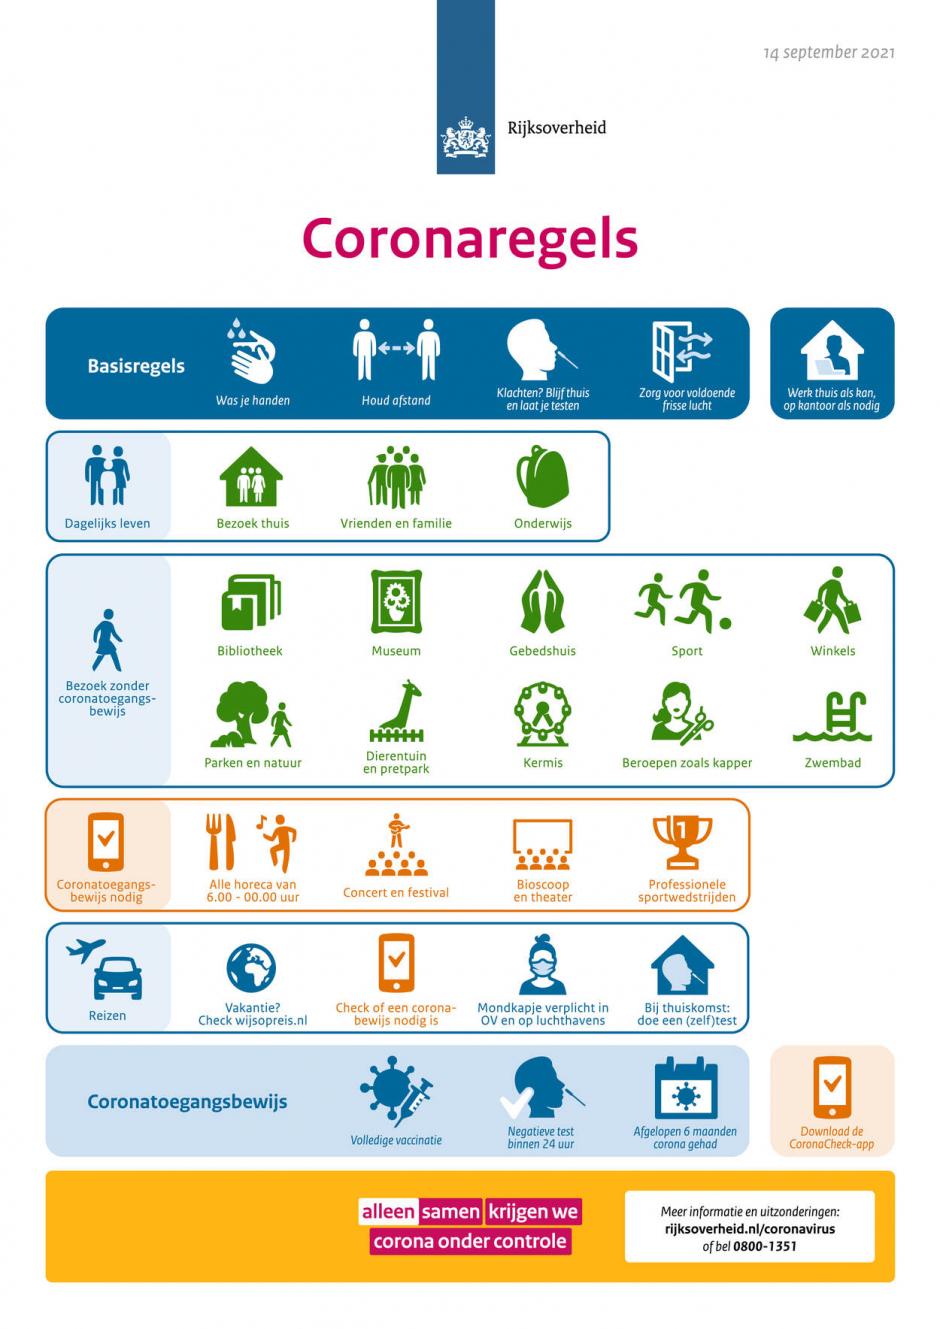 beeldsamenvatting_18_coronaregels_14_september_2021_web_2.jpeg